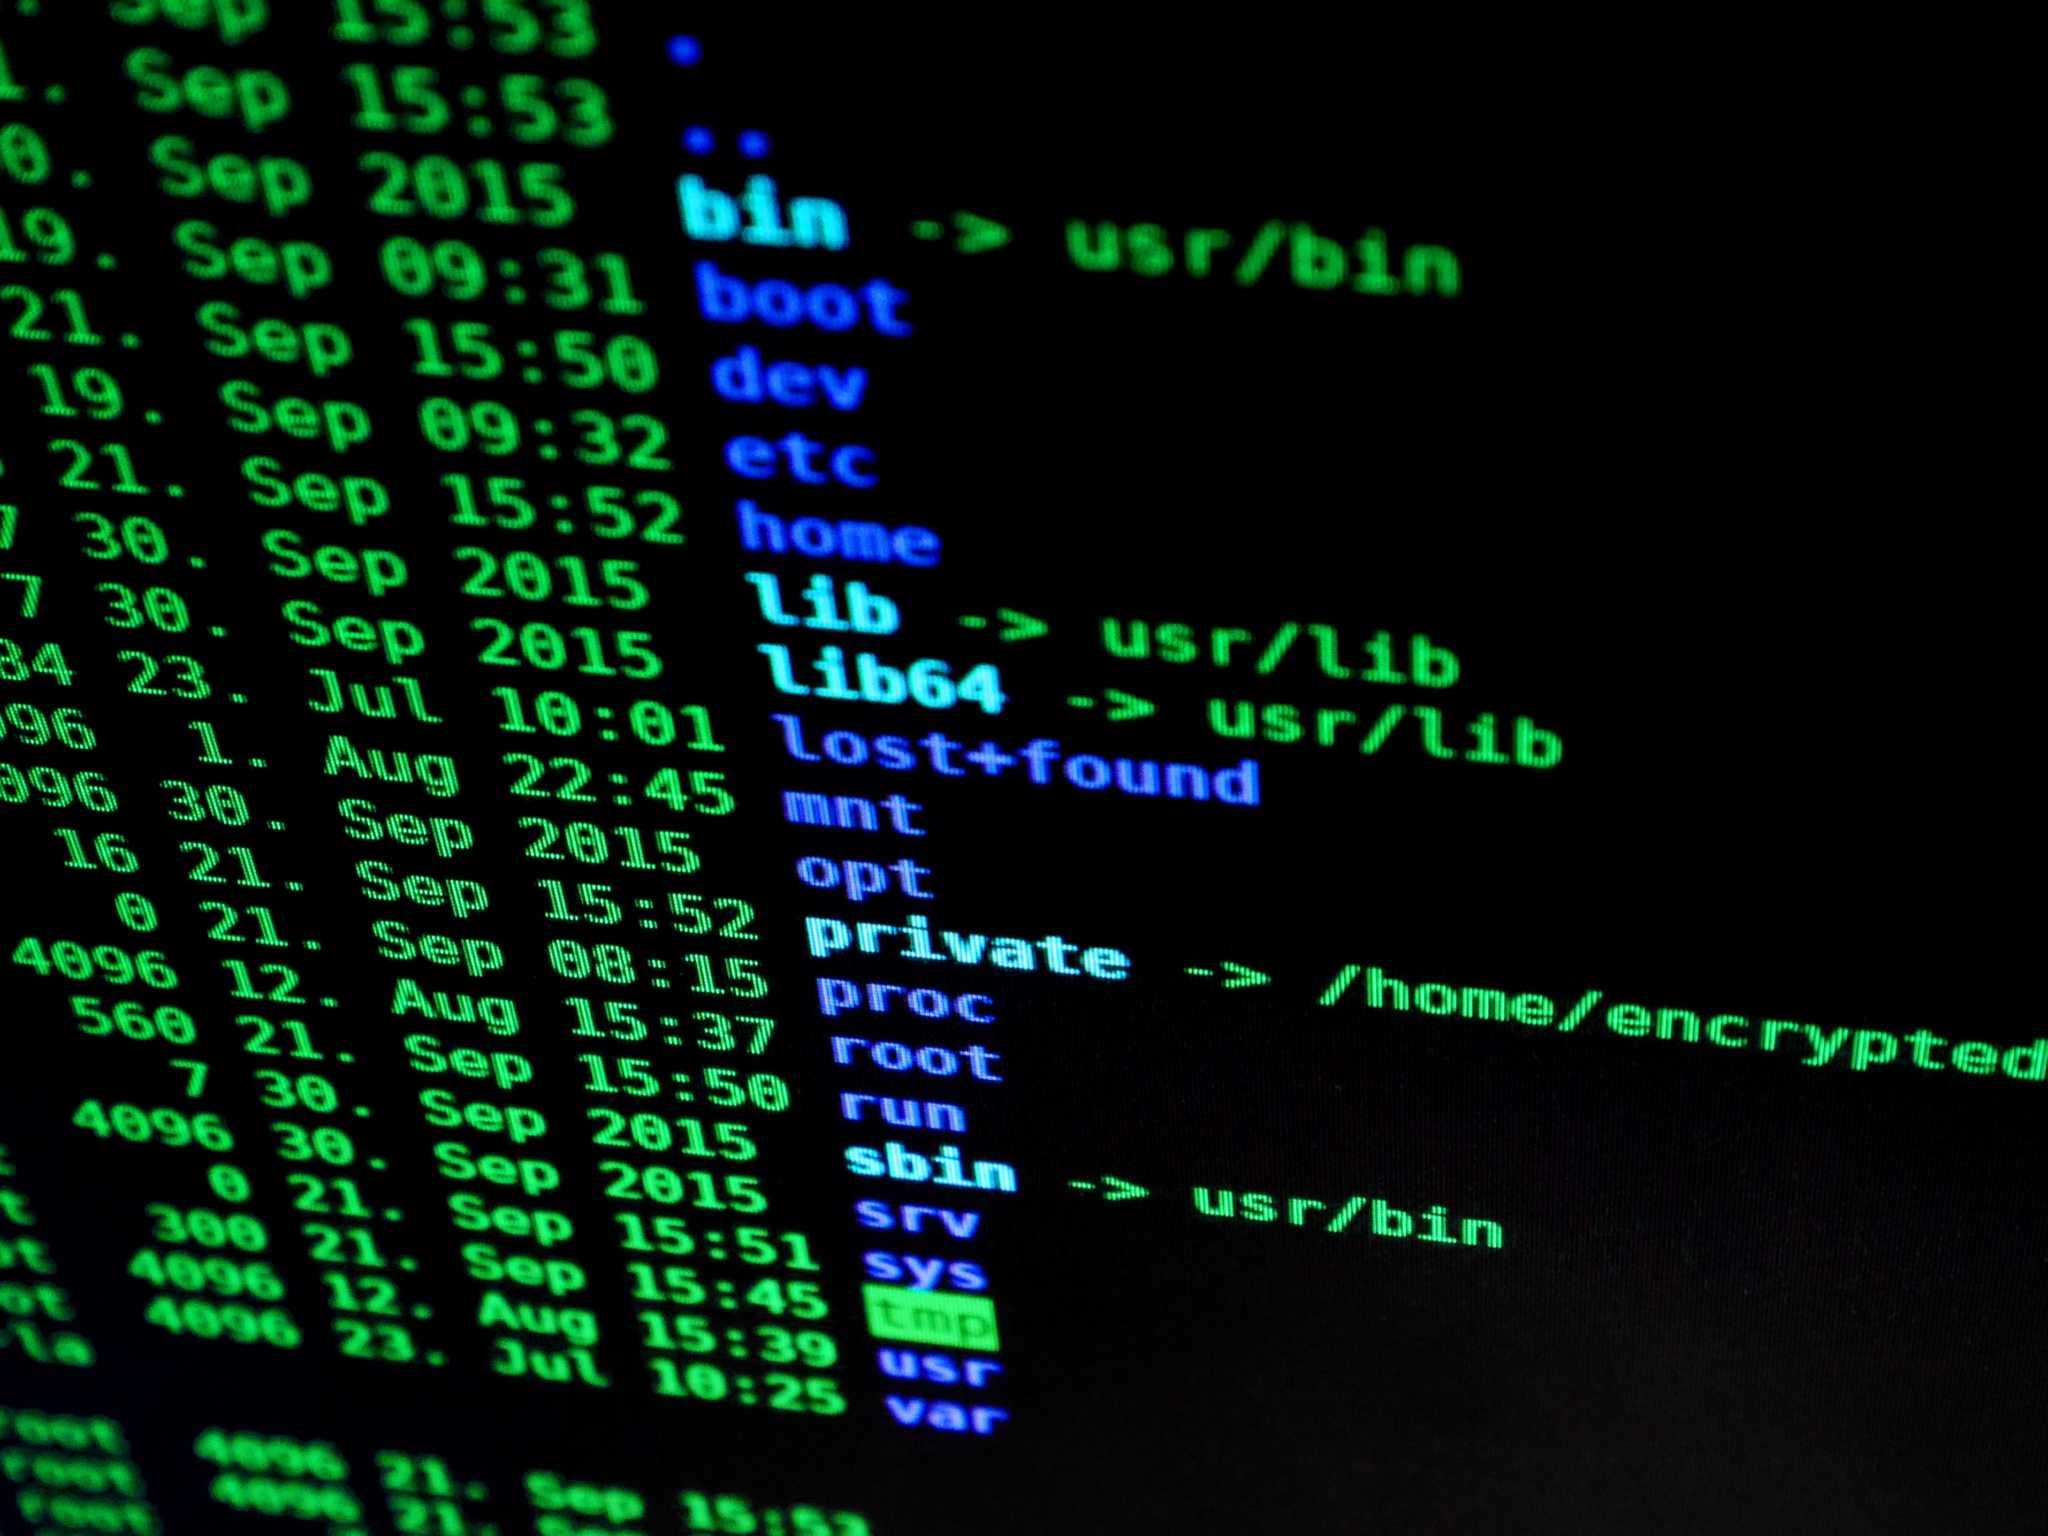 servidor linux segurança